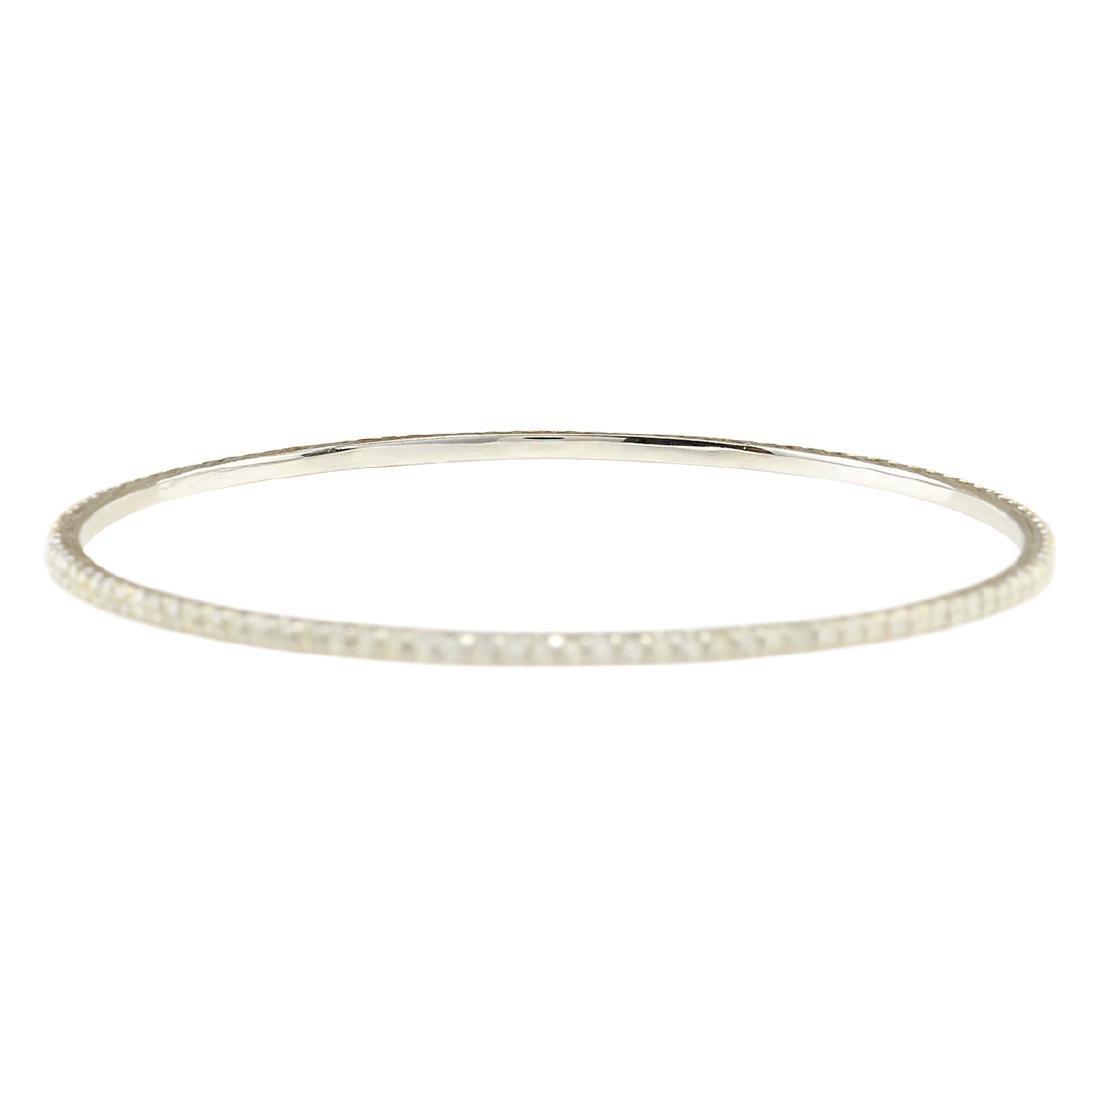 2.25 CTW Natural Diamond Bracelet In 18K Solid White - 2